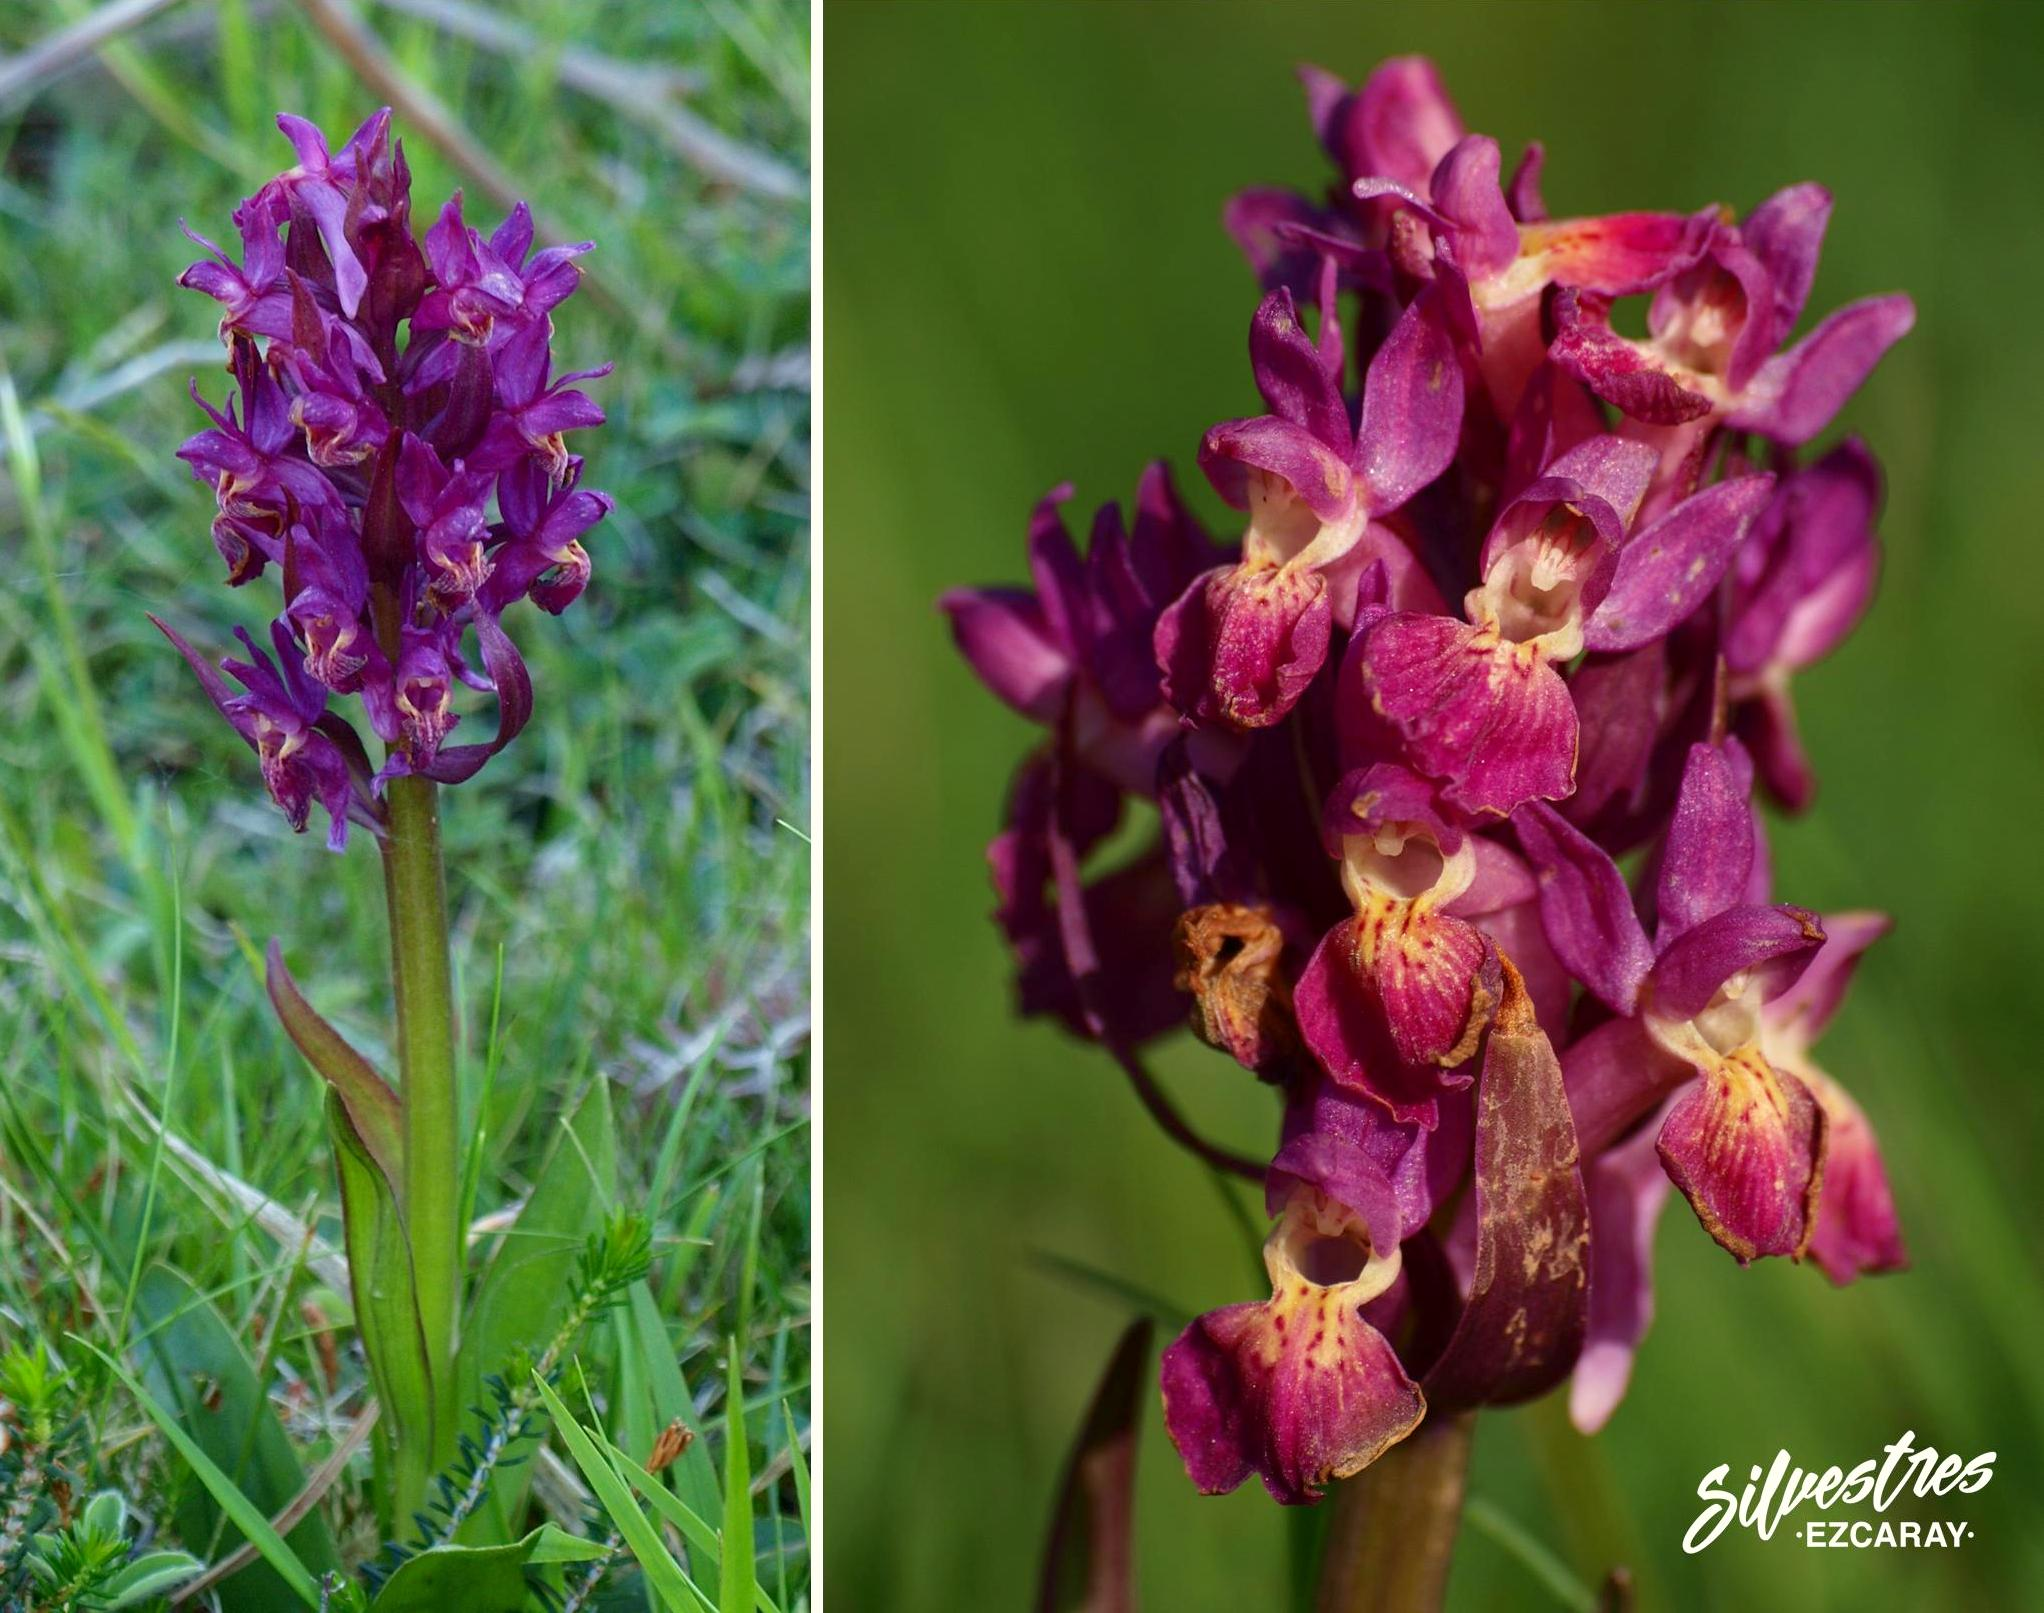 Dactylorhiza_sambucina_ezcaray_la_rioja_catalogo_floristico_citas_botanicas_morfo_fucsia